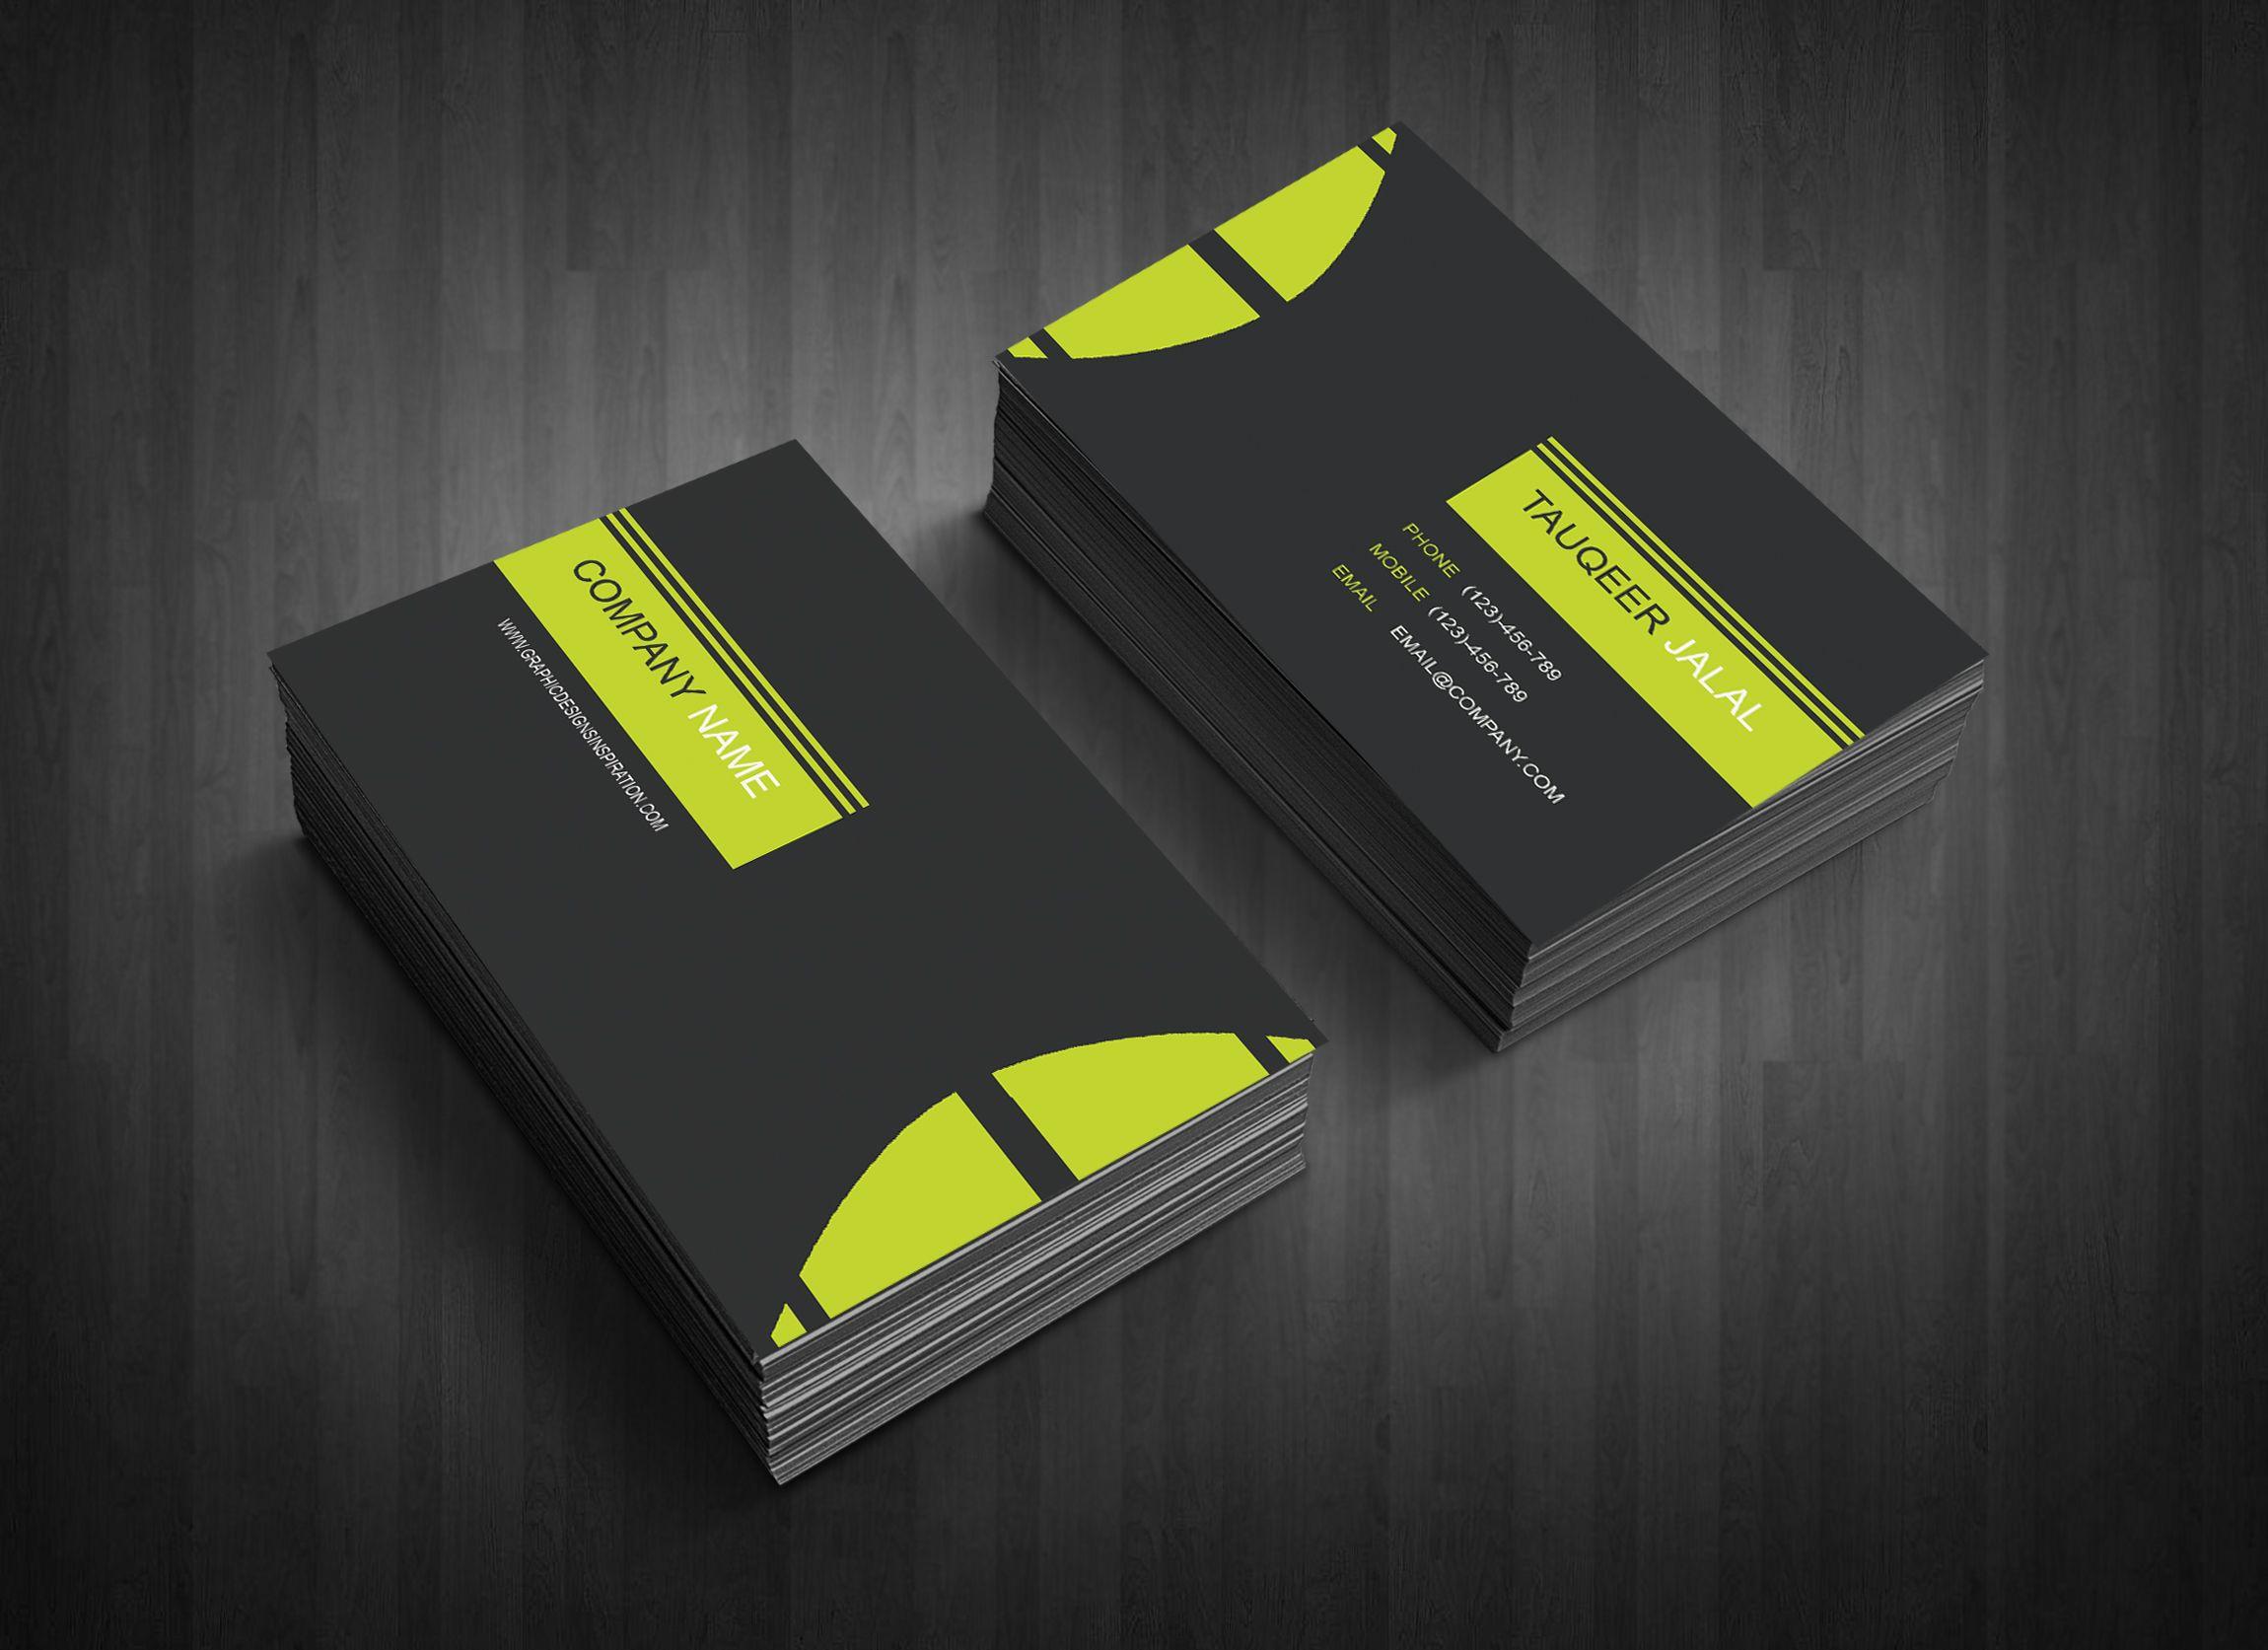 Bunte Doppelseitige Visitenkarten Microsoft Publisher Mit